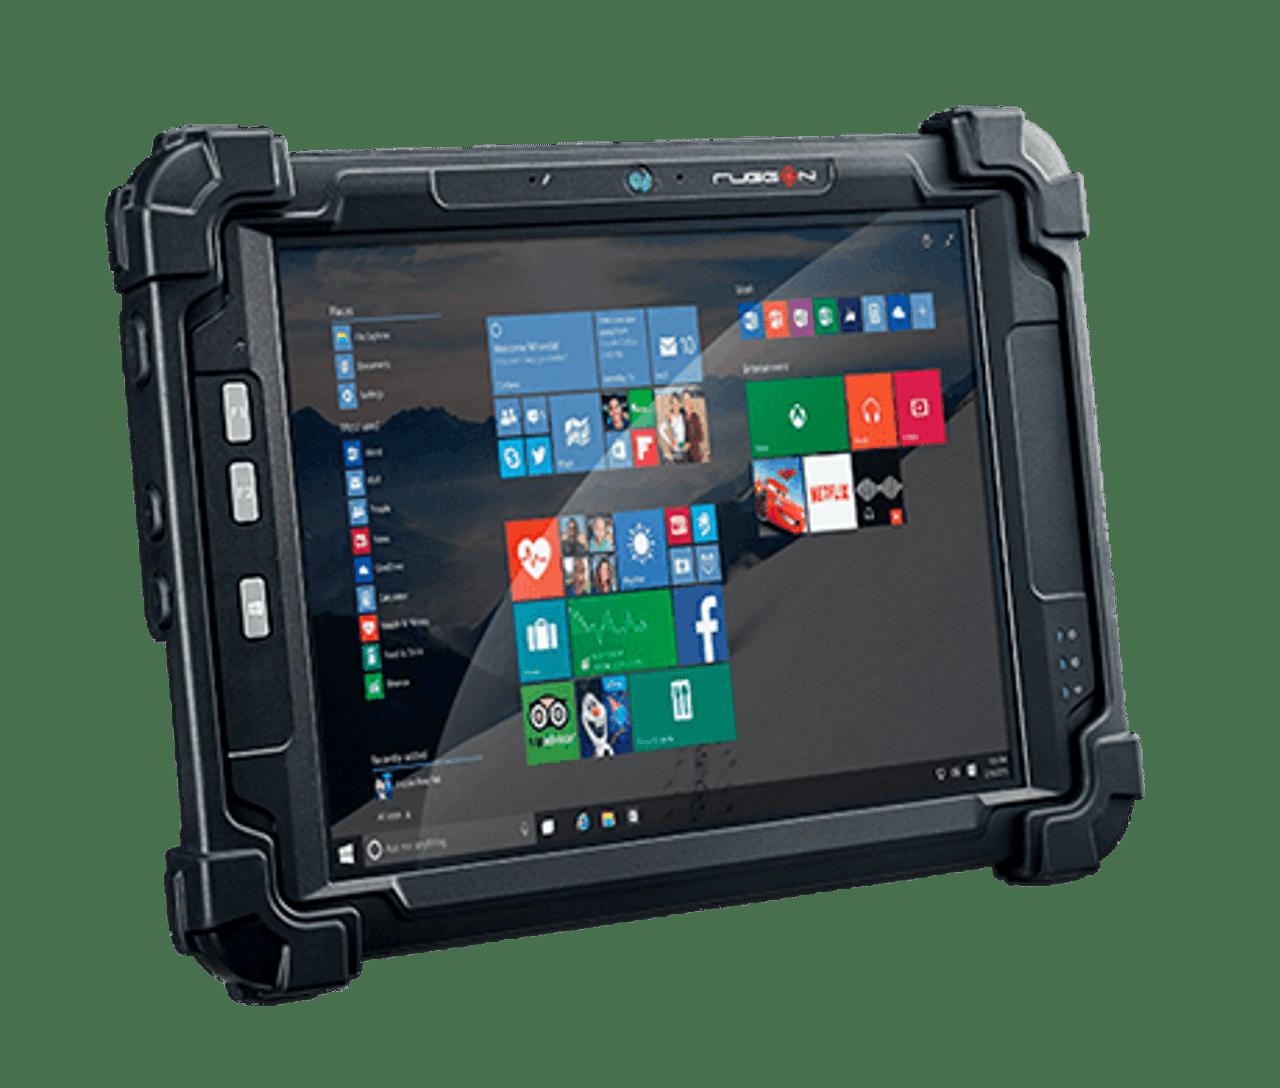 "RuggON Blaxtone PM-522 10.4"" Fully Rugged Tablet"